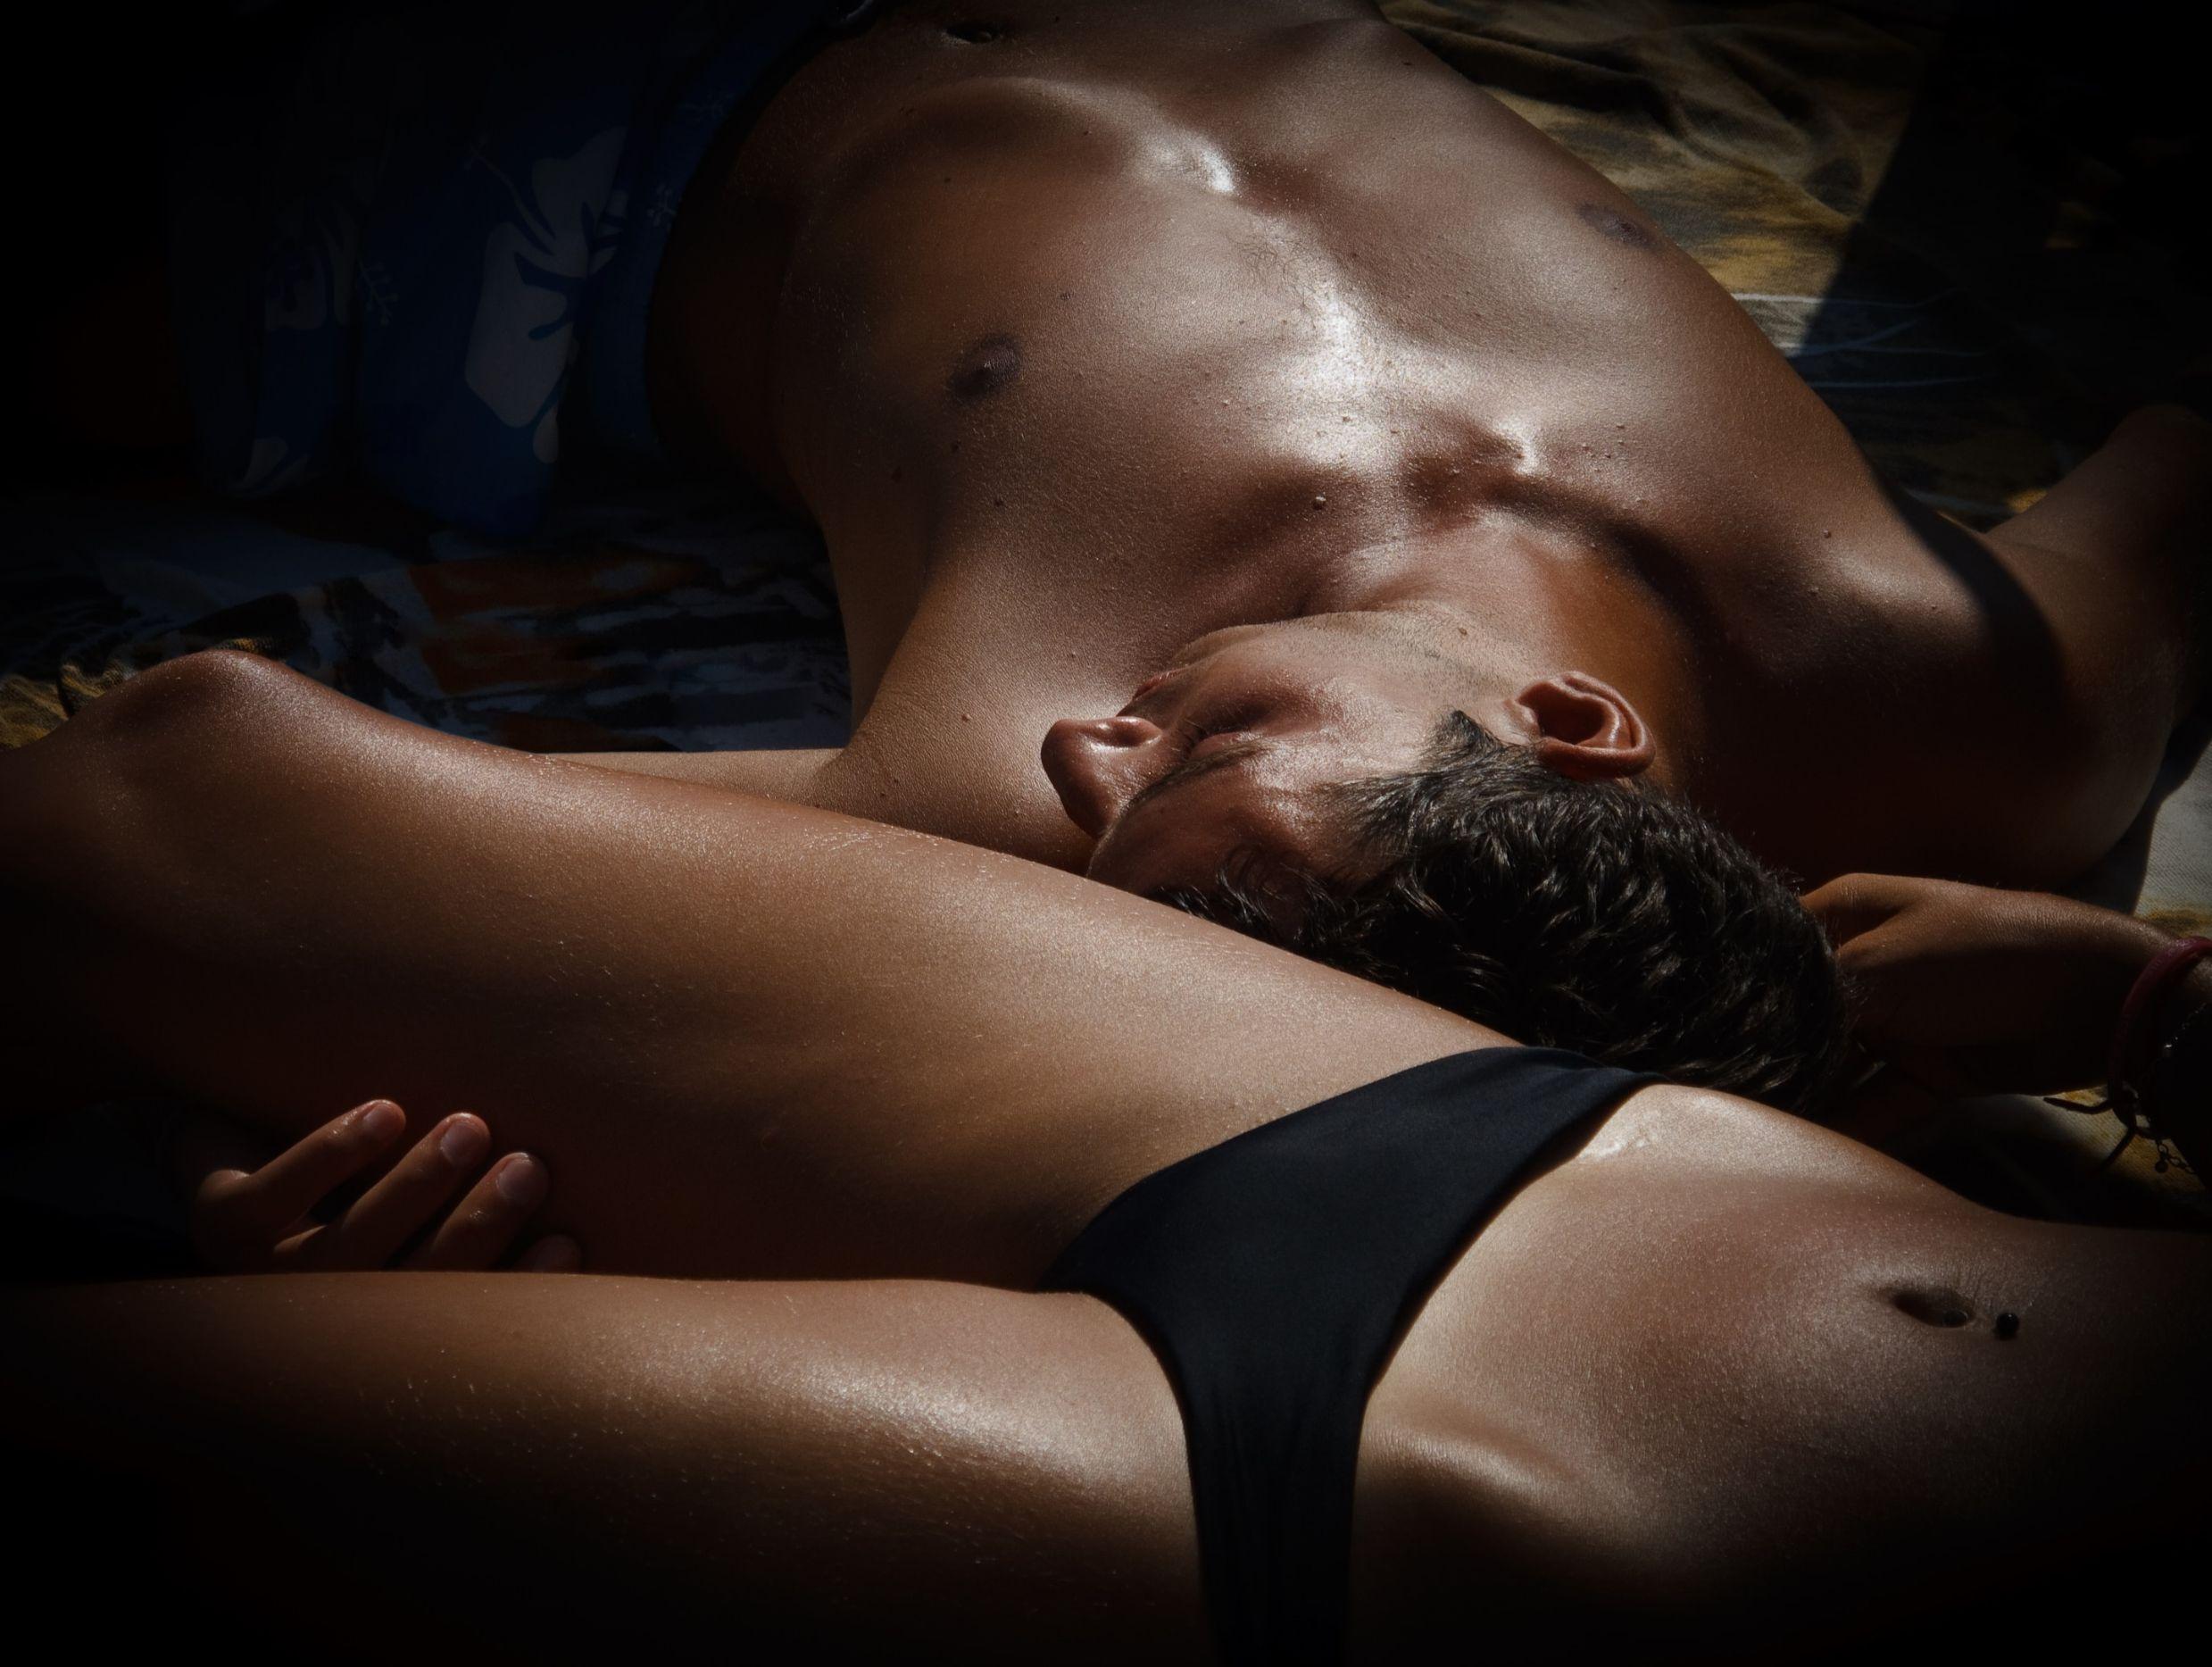 Position photos sex best The 5